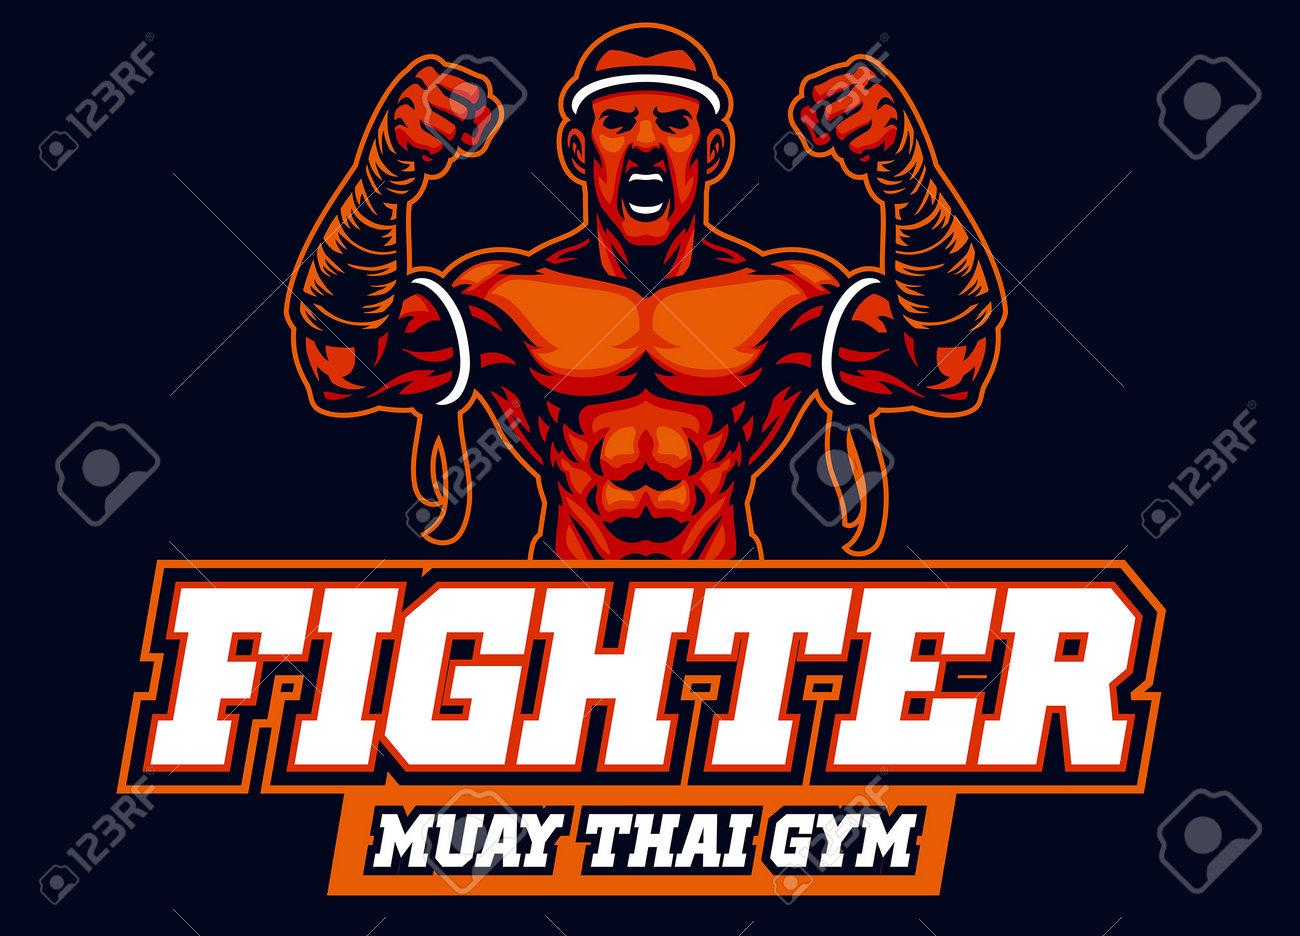 vector of mascot of muay thai fighter - 165301243